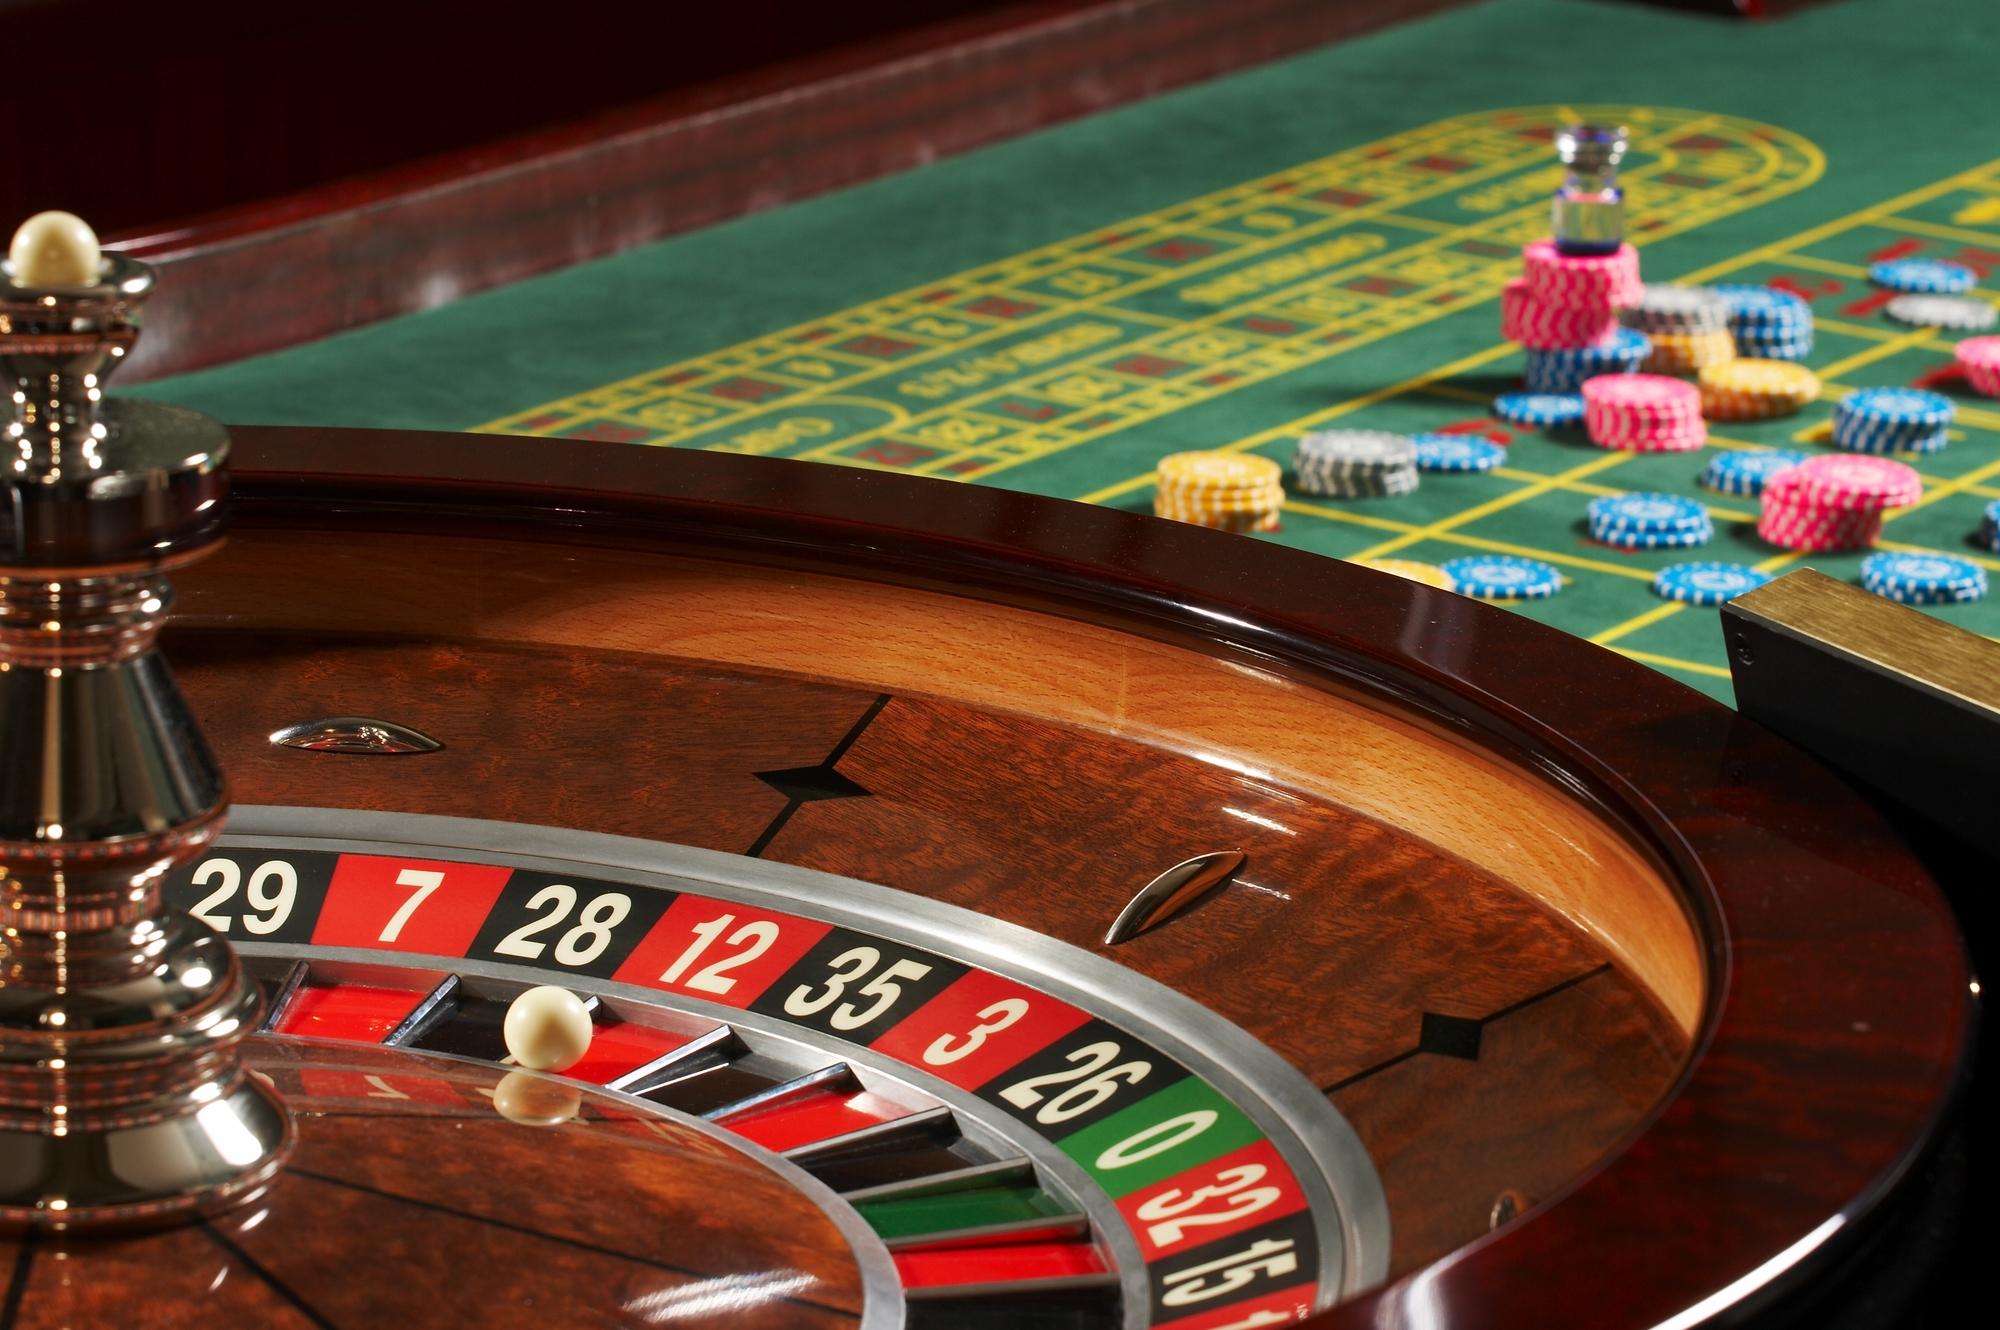 прокат казино